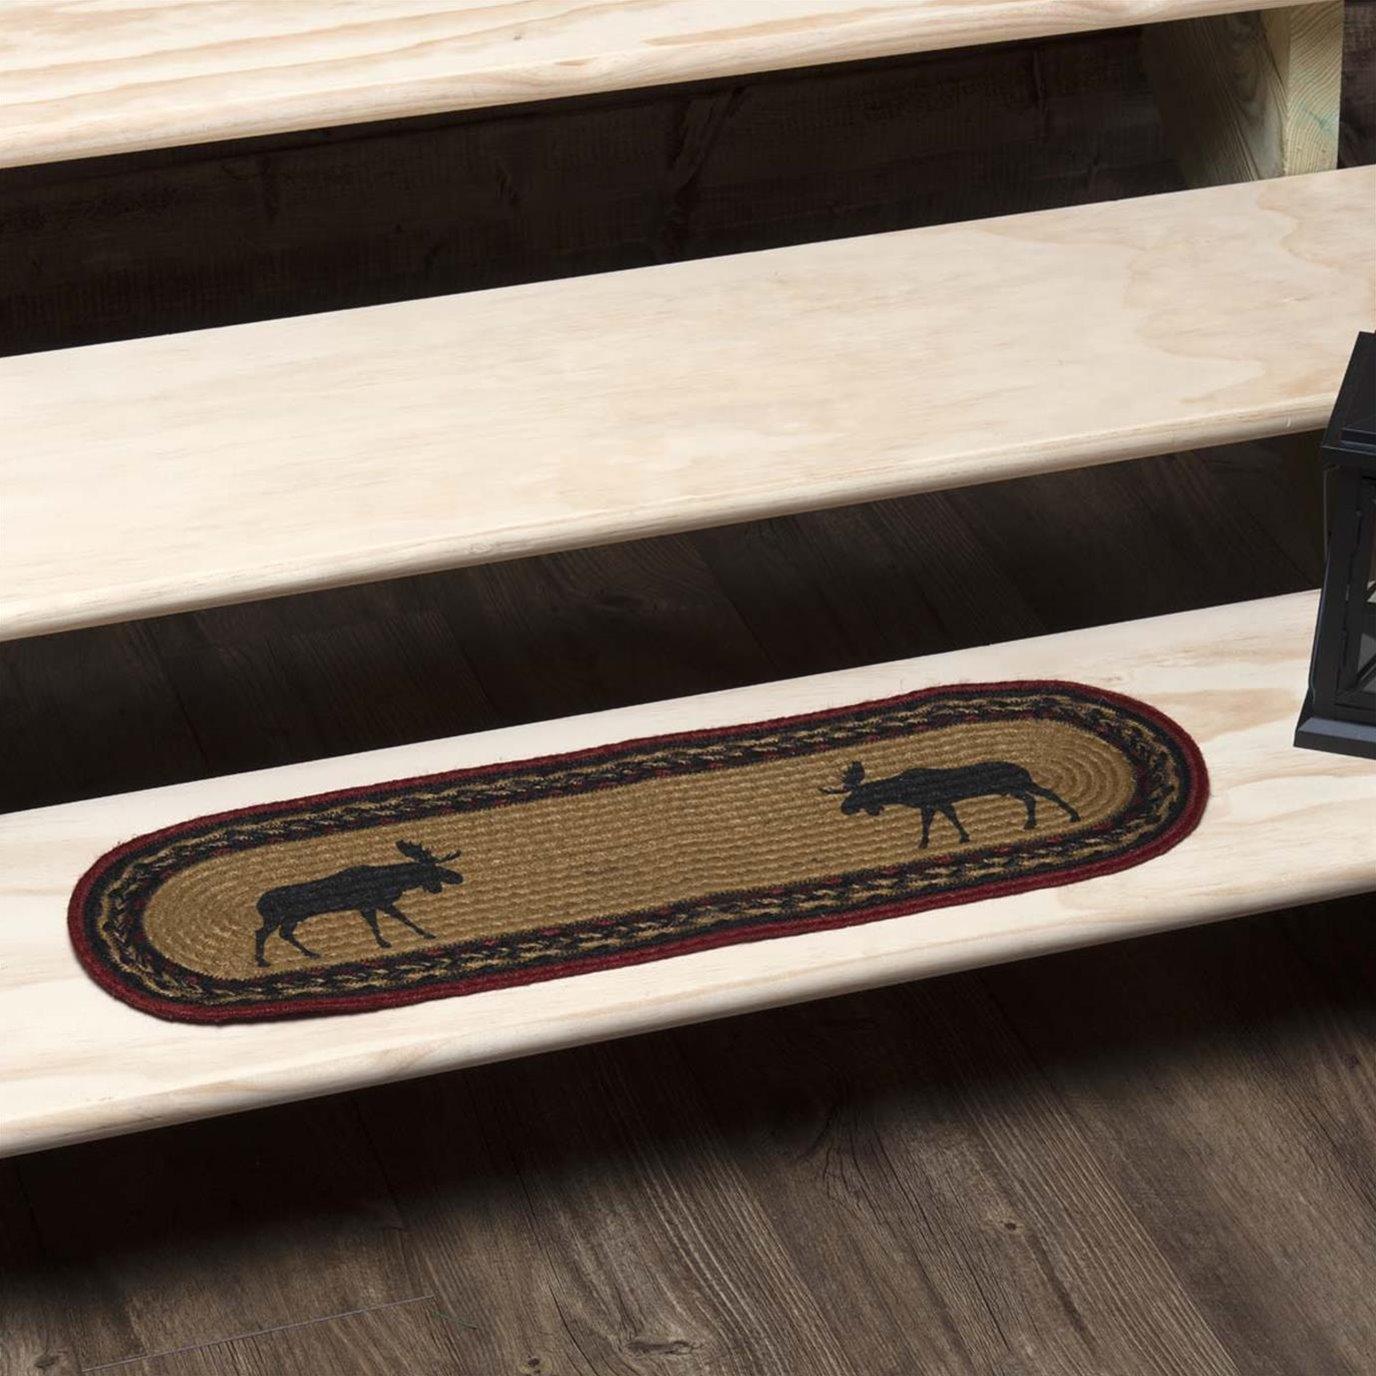 Cumberland Stenciled Moose Jute Stair Tread Oval Latex 8.5x27